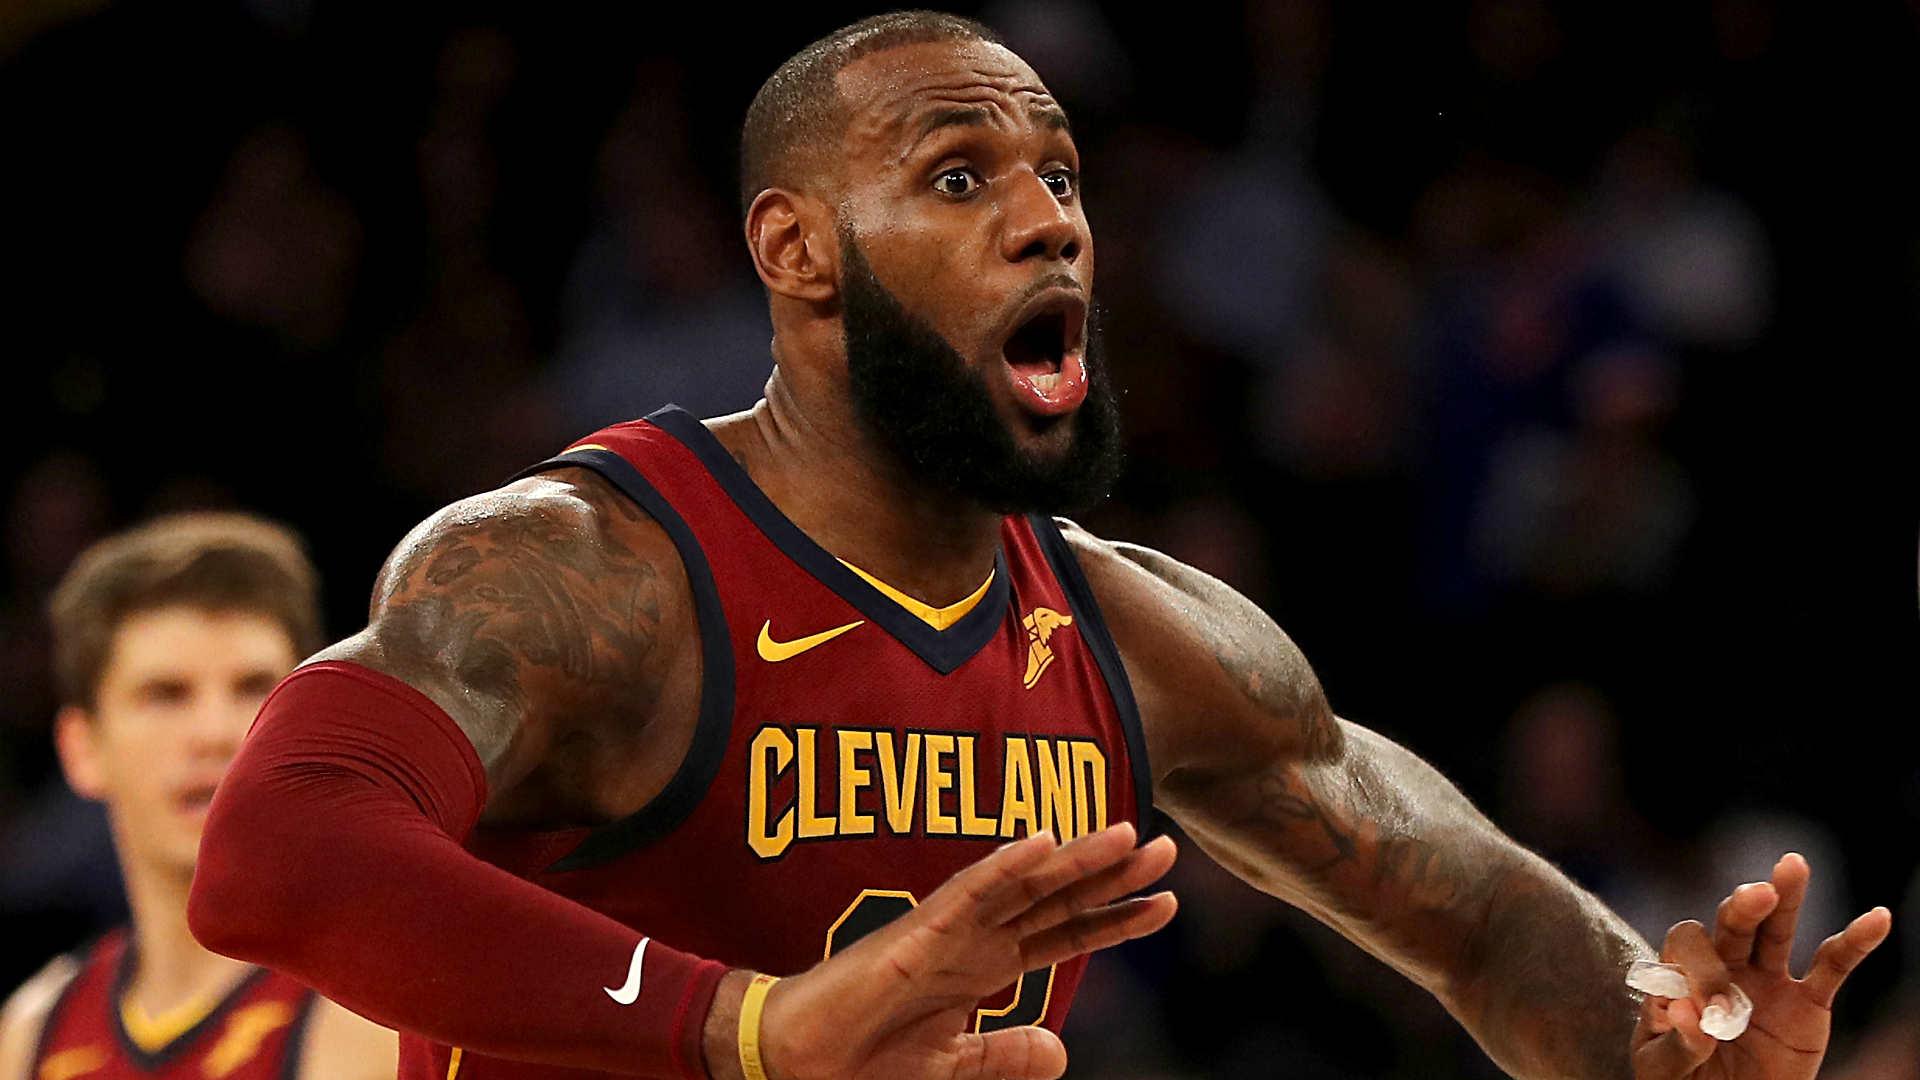 LeBron James, Cavs find motivation amid rigors of regular season